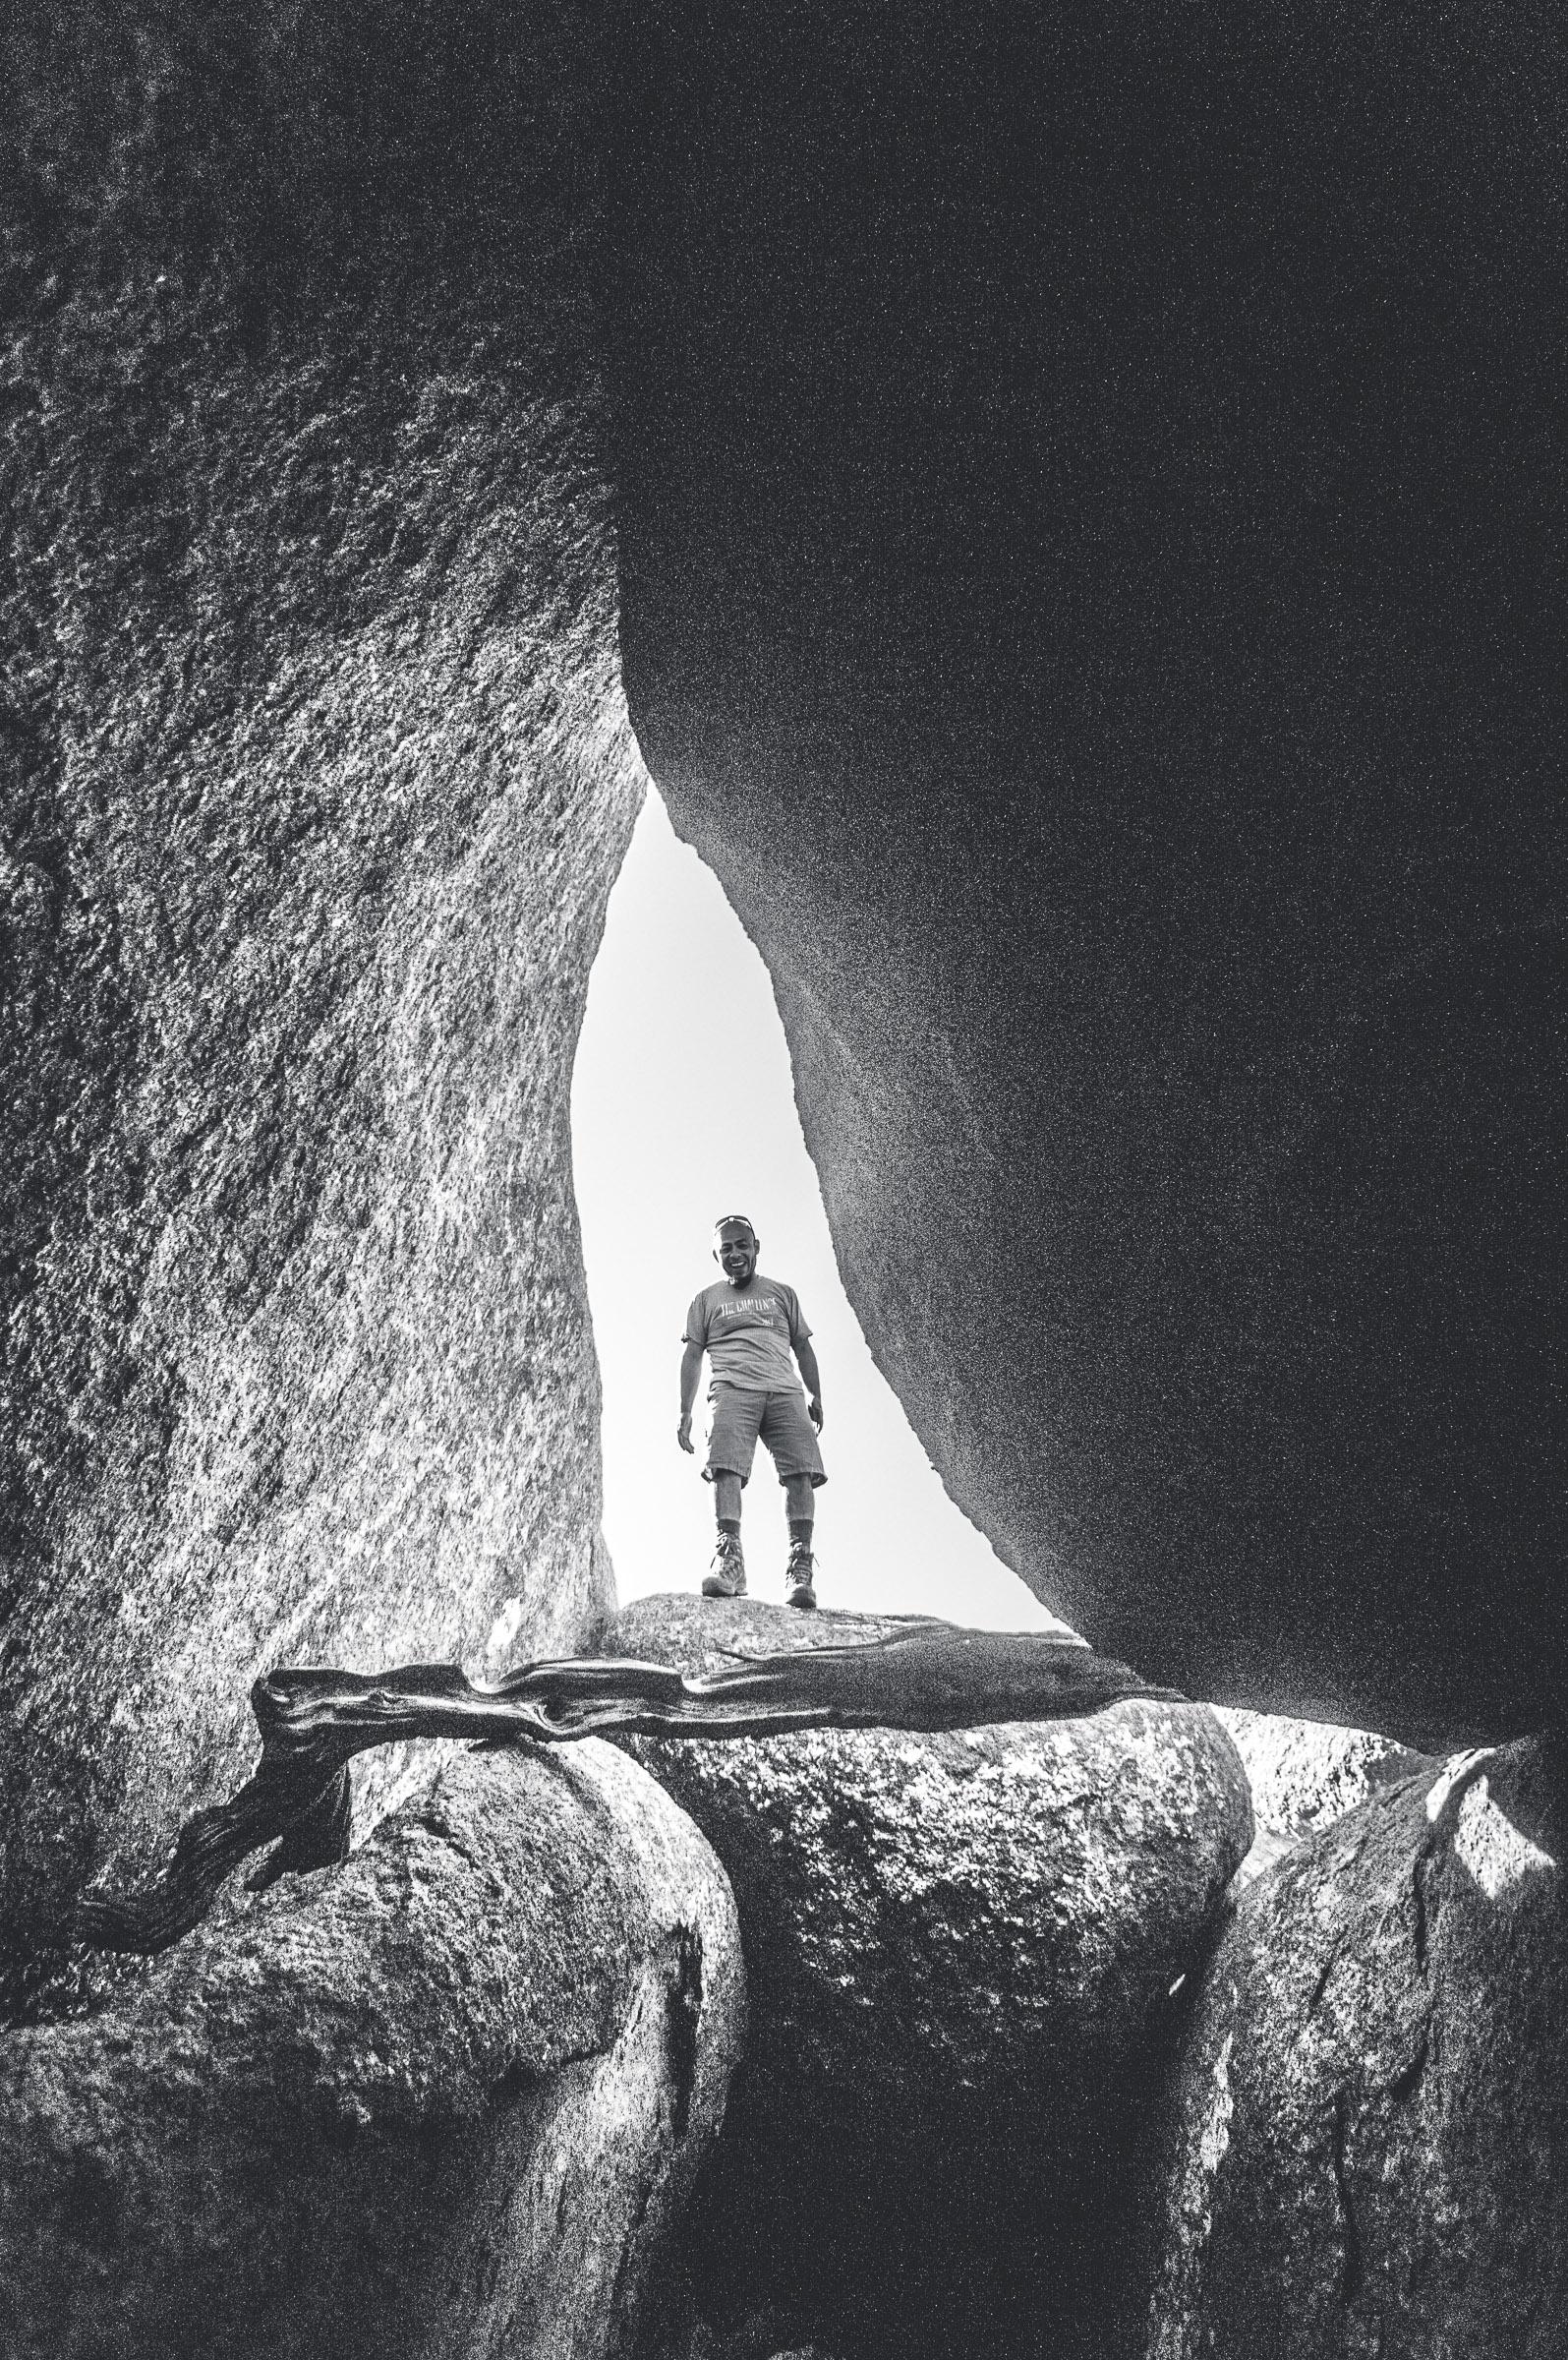 Spanish Cave 11-12-16 B&W (12 of 33).JPG